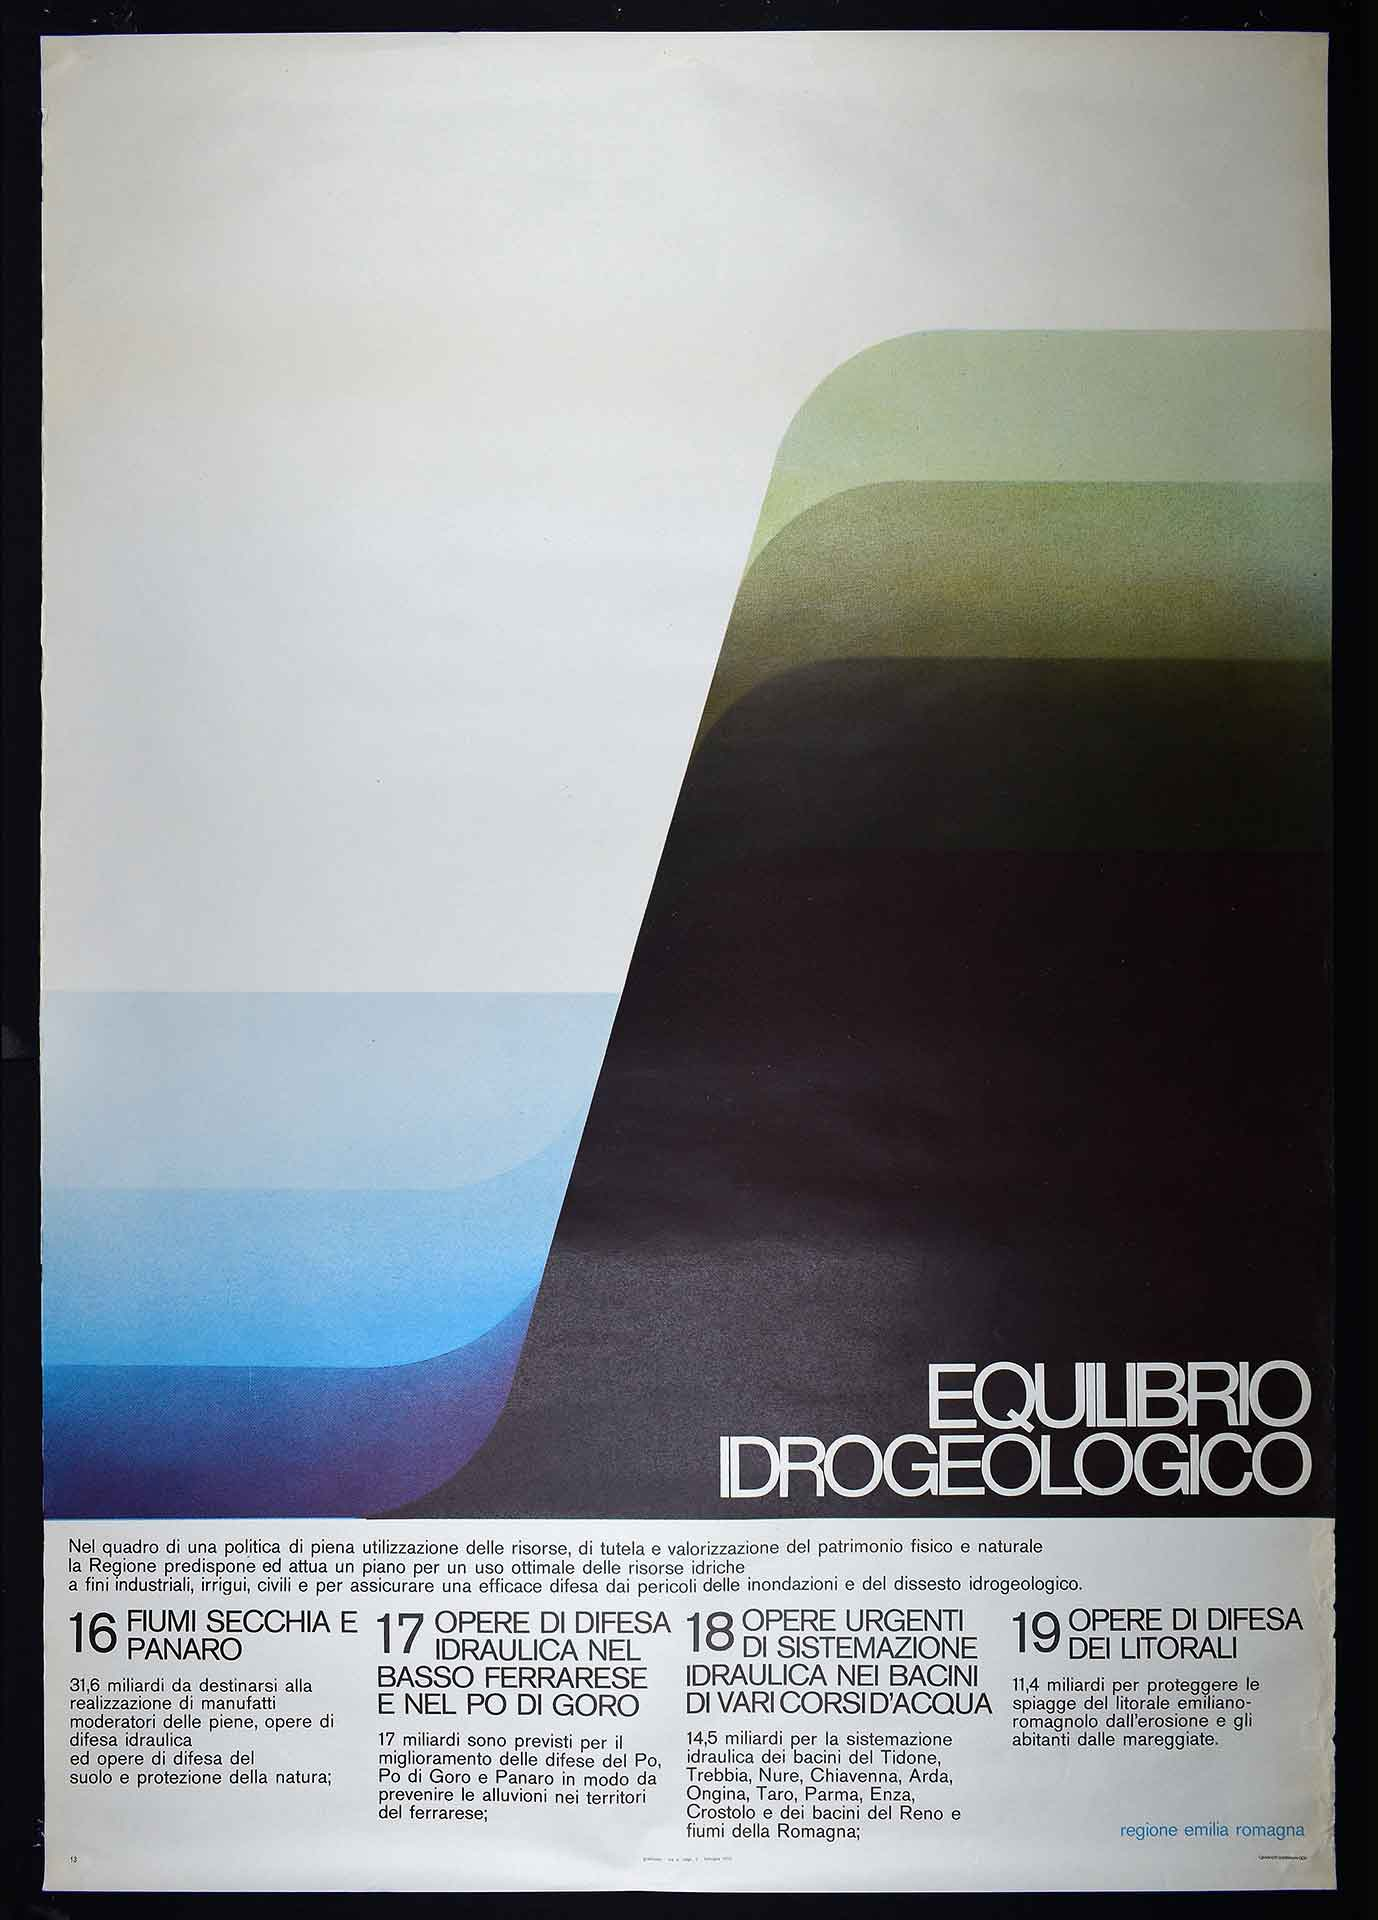 1975. Regione Emilia-Romagna. Stampa Graficoop, Bologna. Campagna istituzionale.